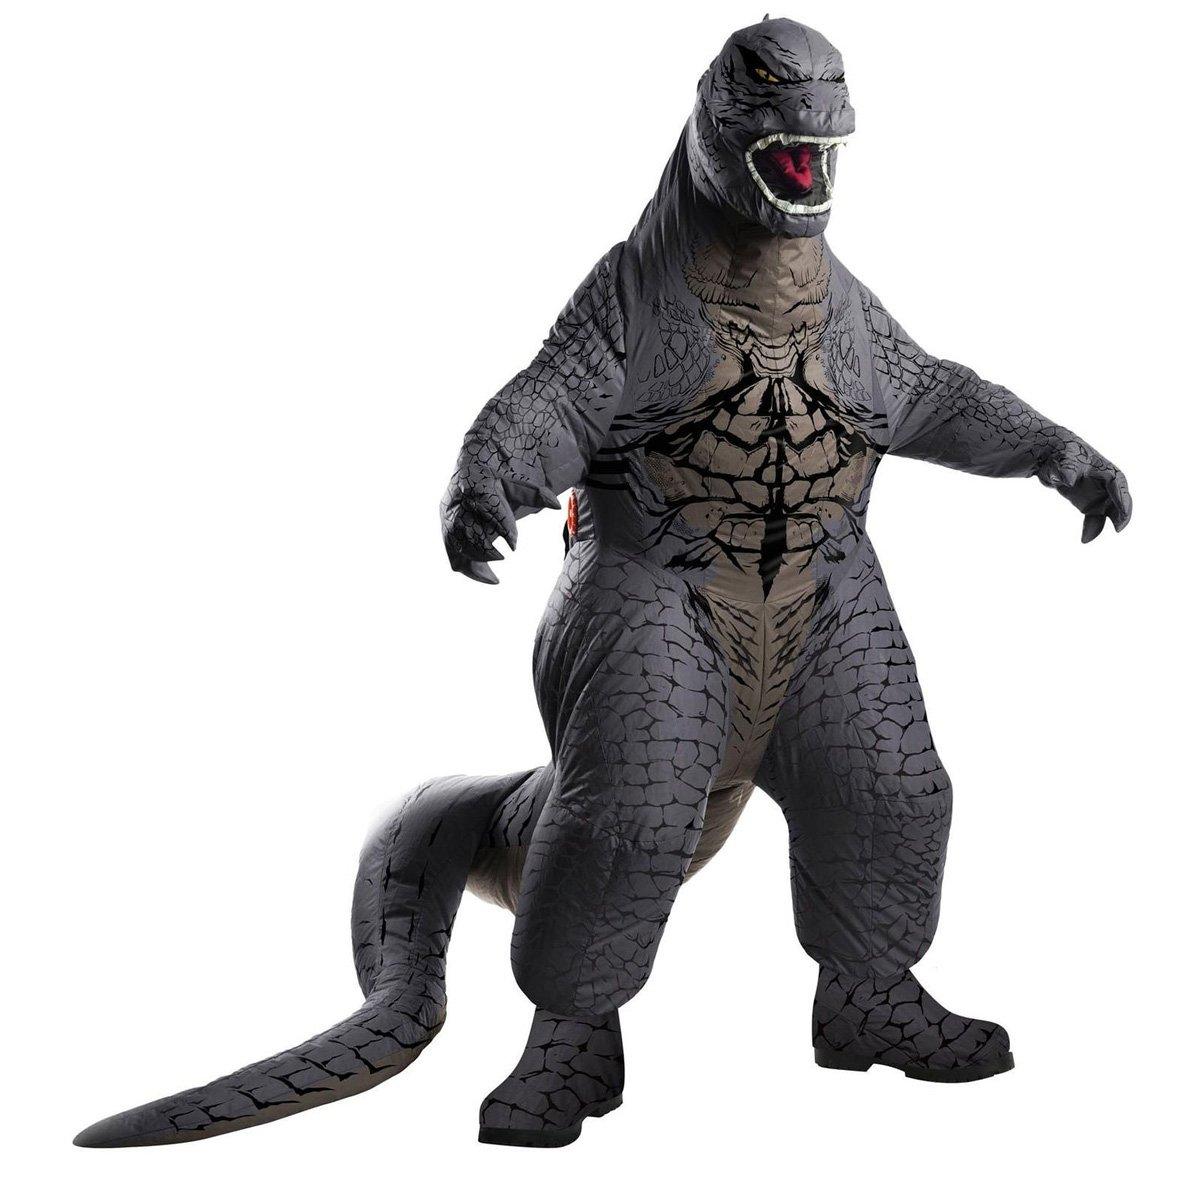 Inflatable Godzilla Costume The Green Head